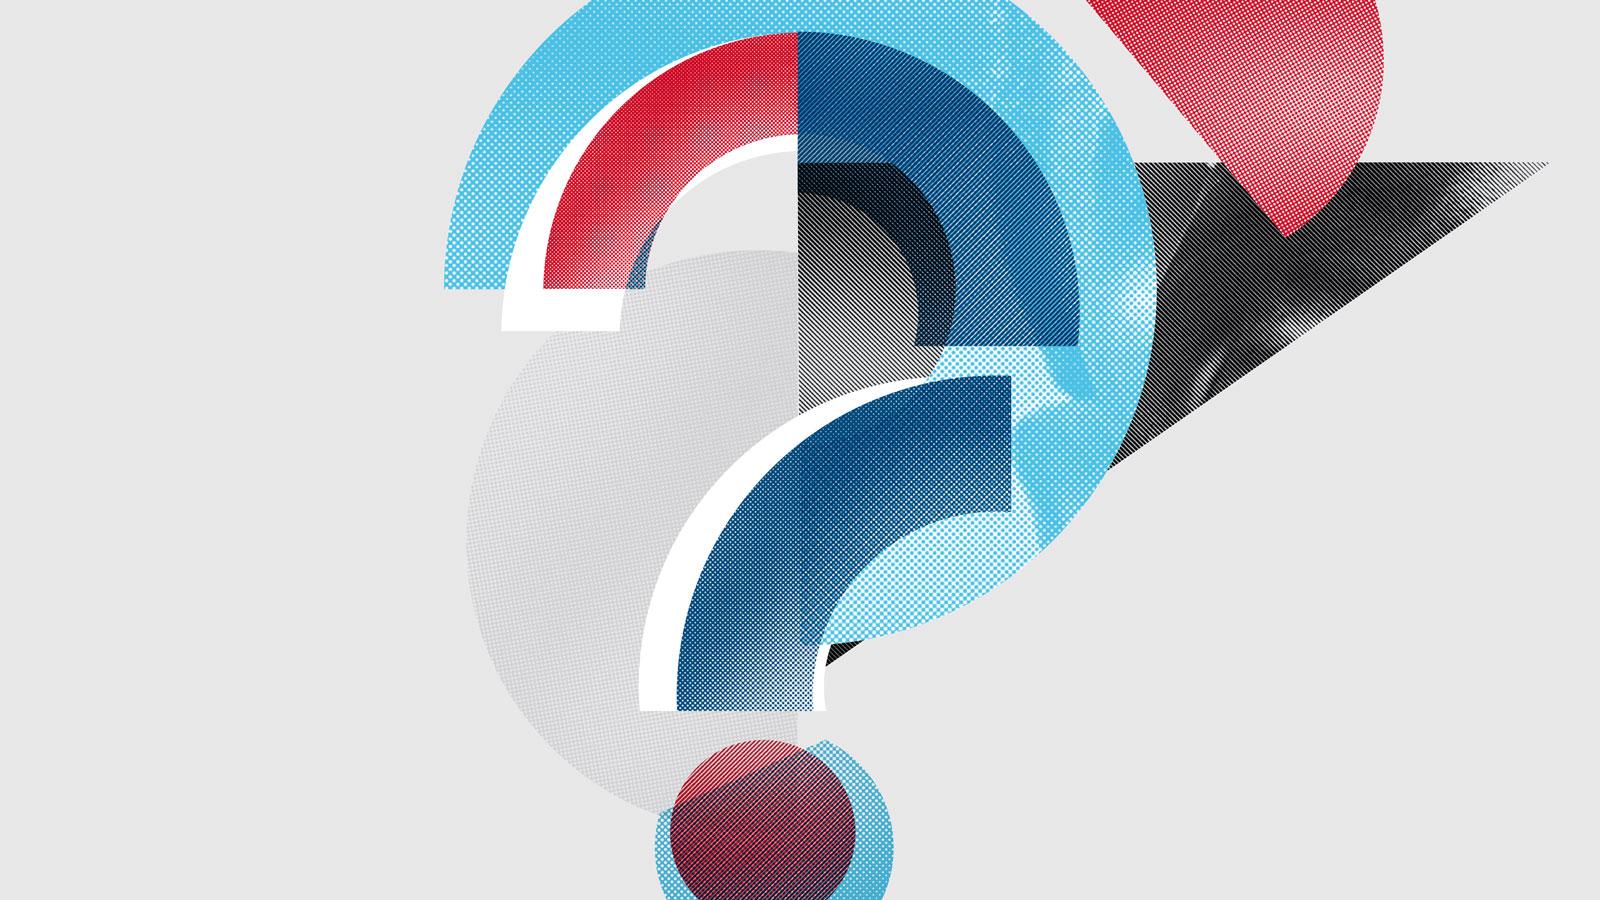 Aspen-EventBranding-Questionmarks1